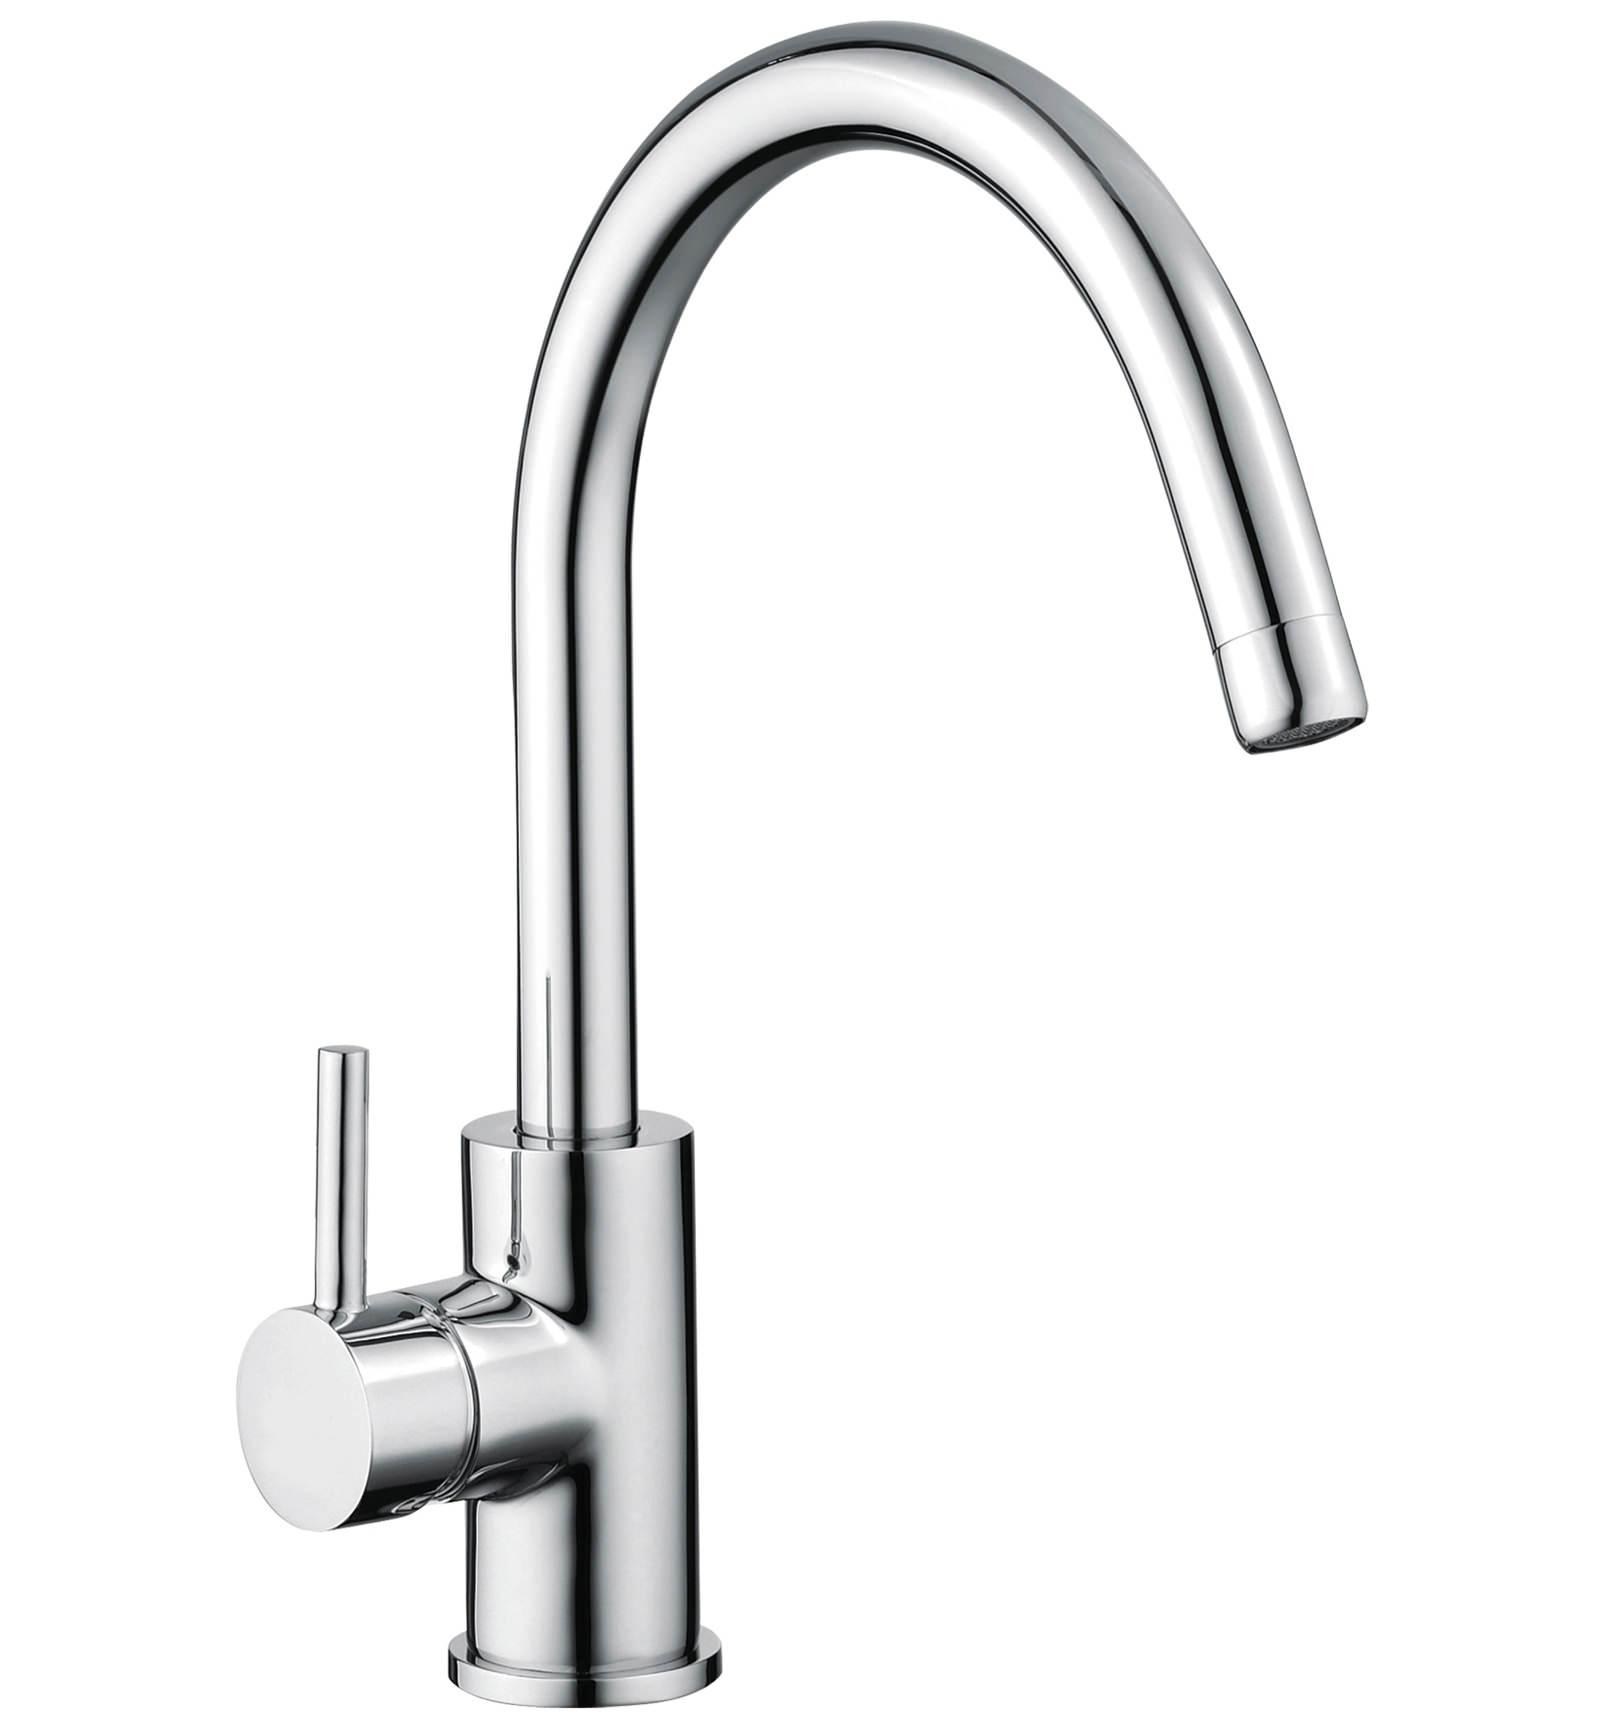 Sagittarius Ergo Side Lever Monobloc Kitchen Sink Mixer